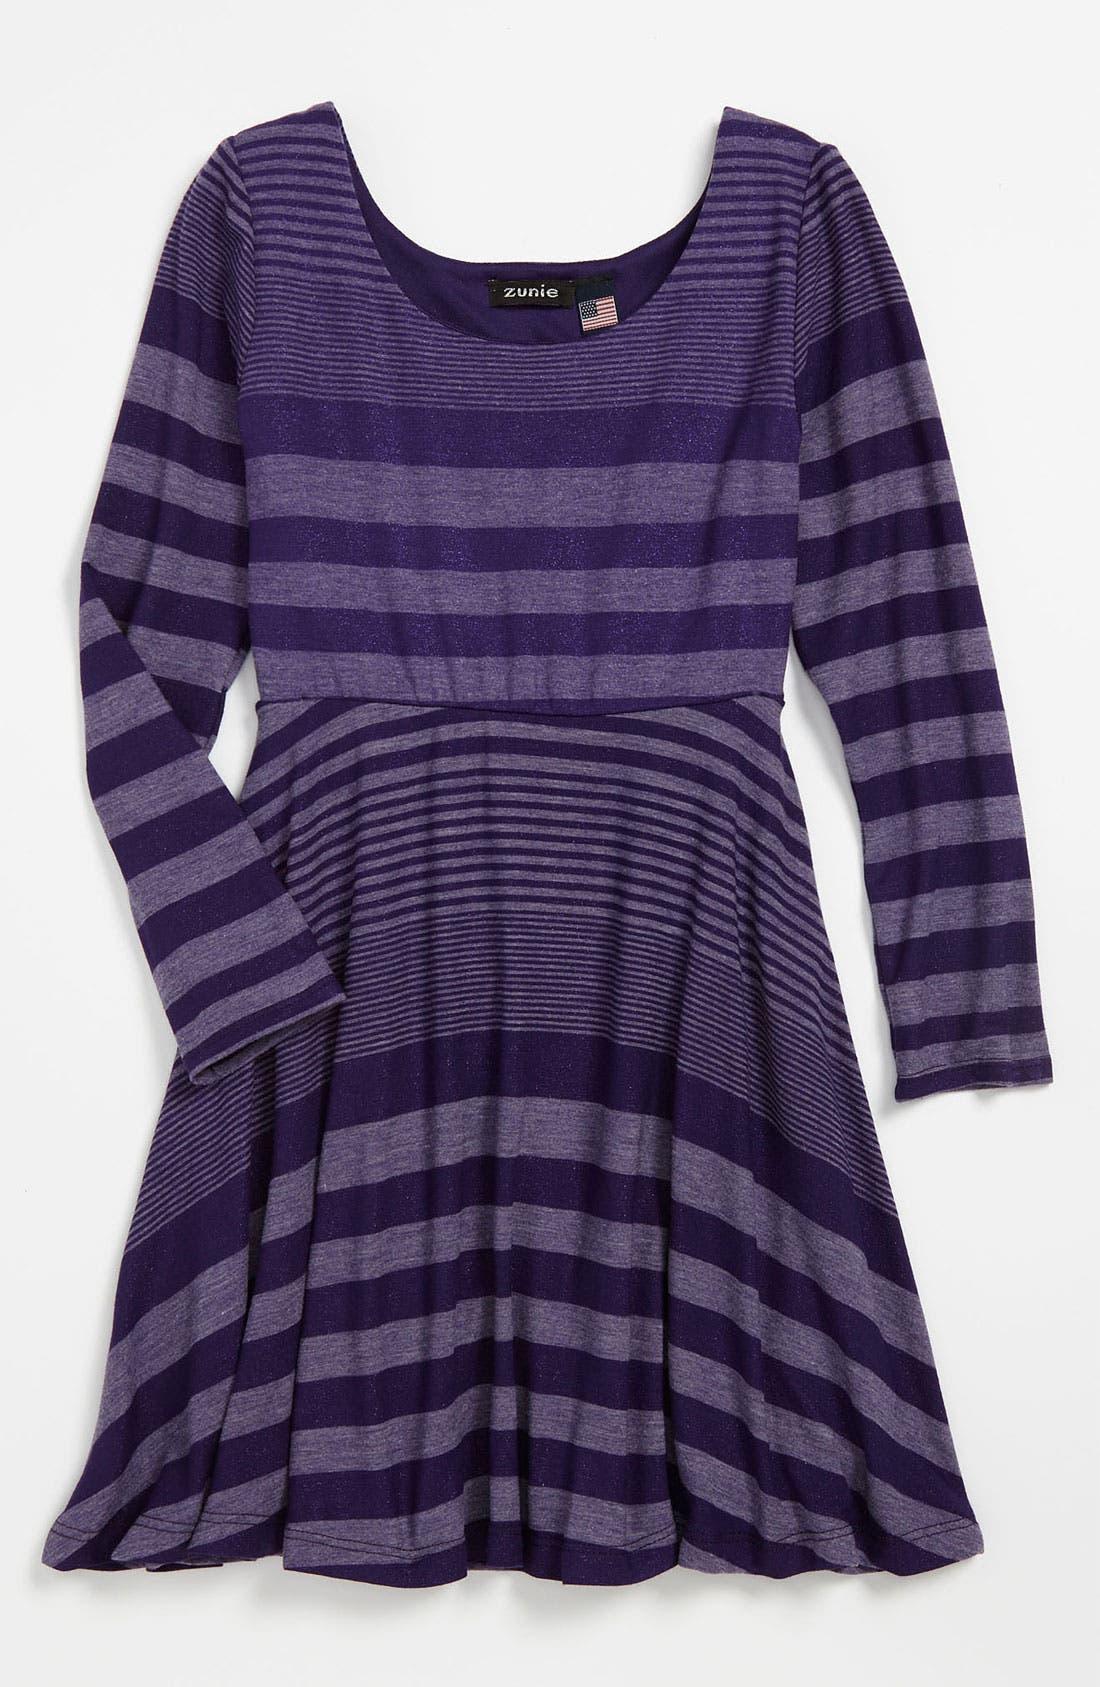 Alternate Image 1 Selected - Zunie 'Foil' Knit Dress (Little Girls)